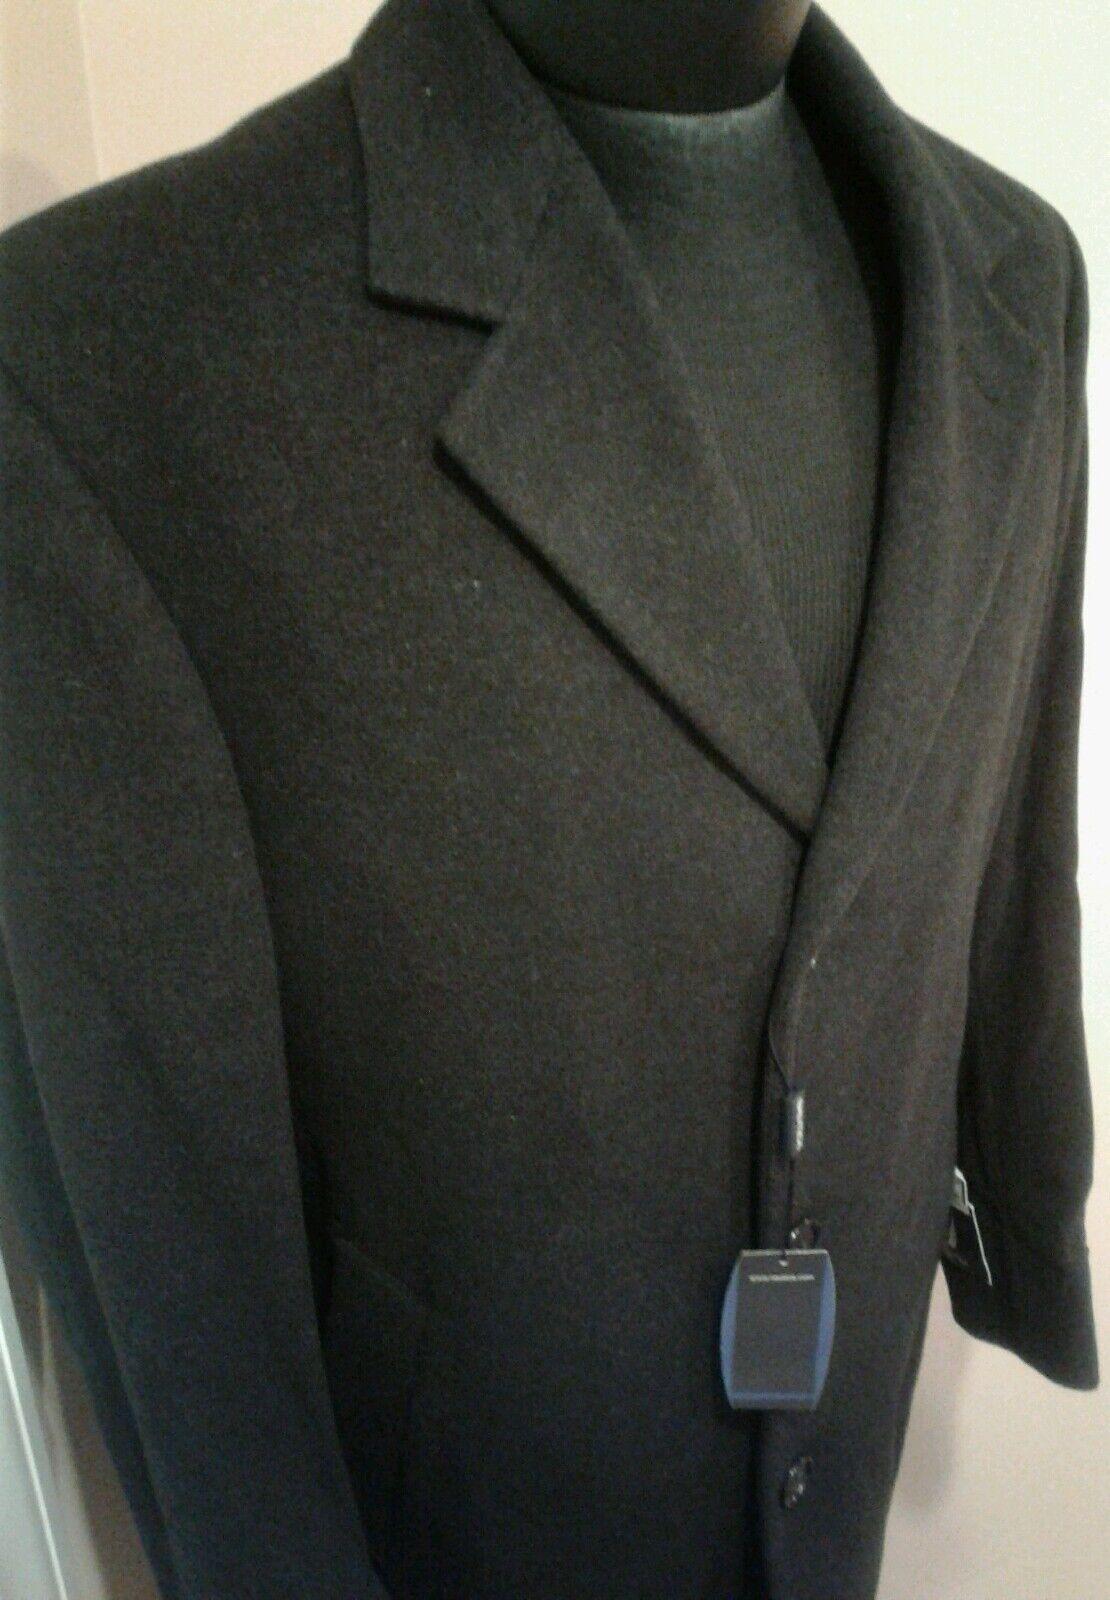 BNWT Nautica Charcoal Grey Topcoat 38S new cashmere blend